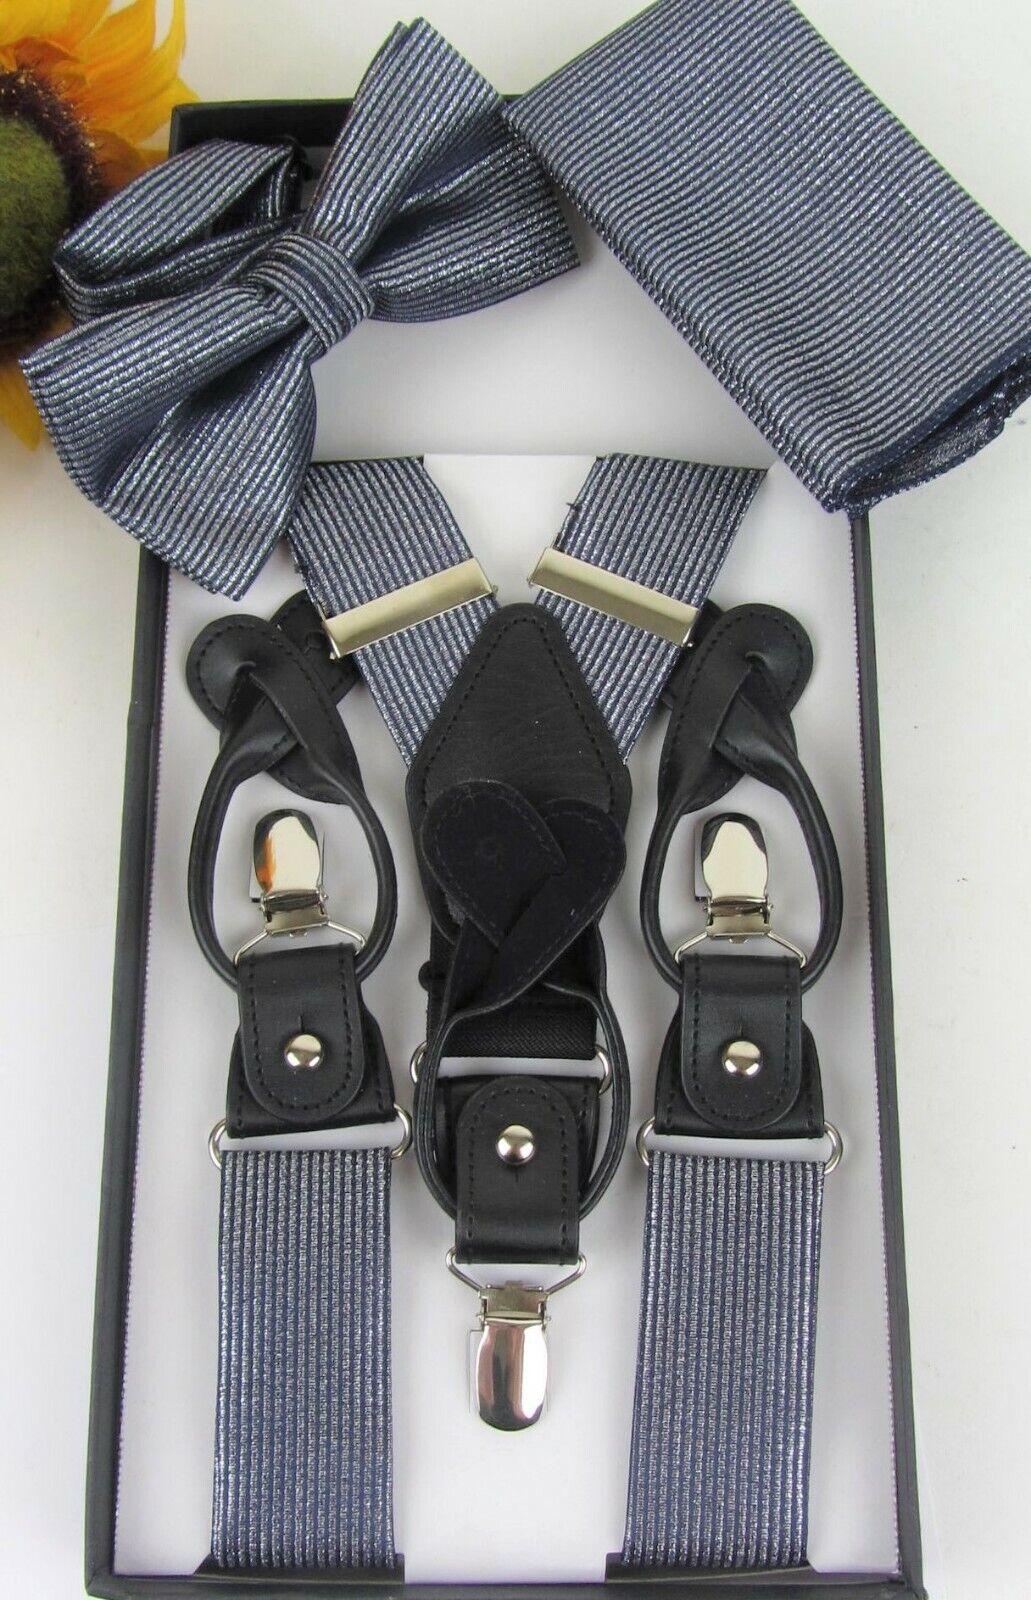 VITTORIO VICO Silver Metallic Suspenders & Bow Tie Set * Button or Clip *